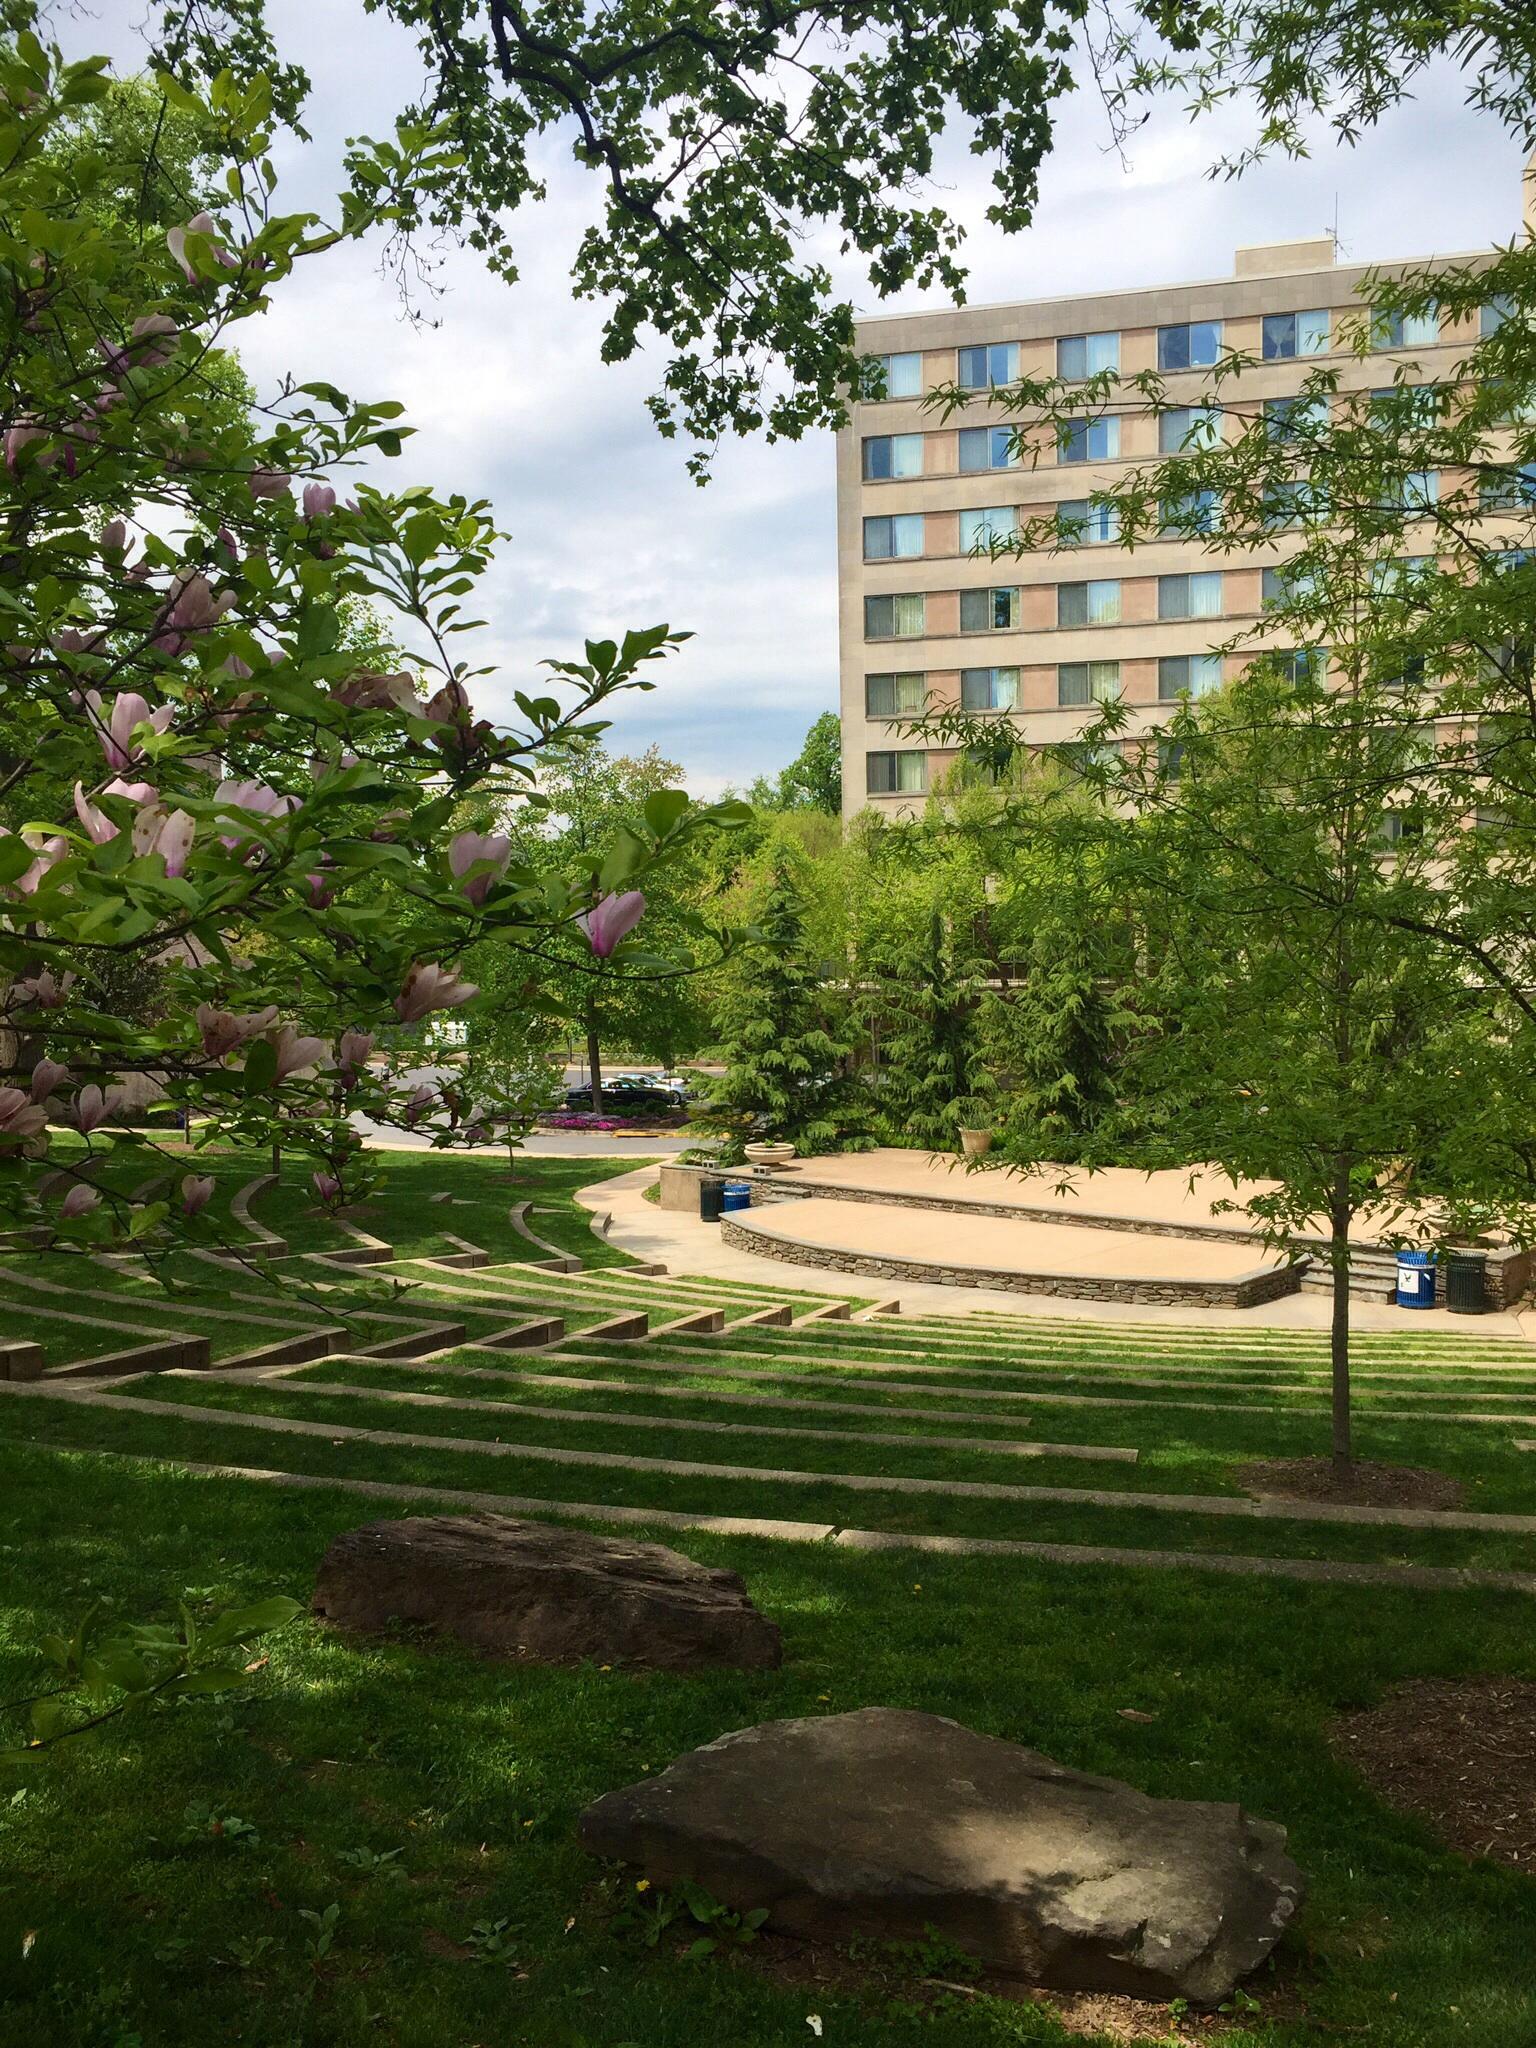 American University - Washington, D.C.